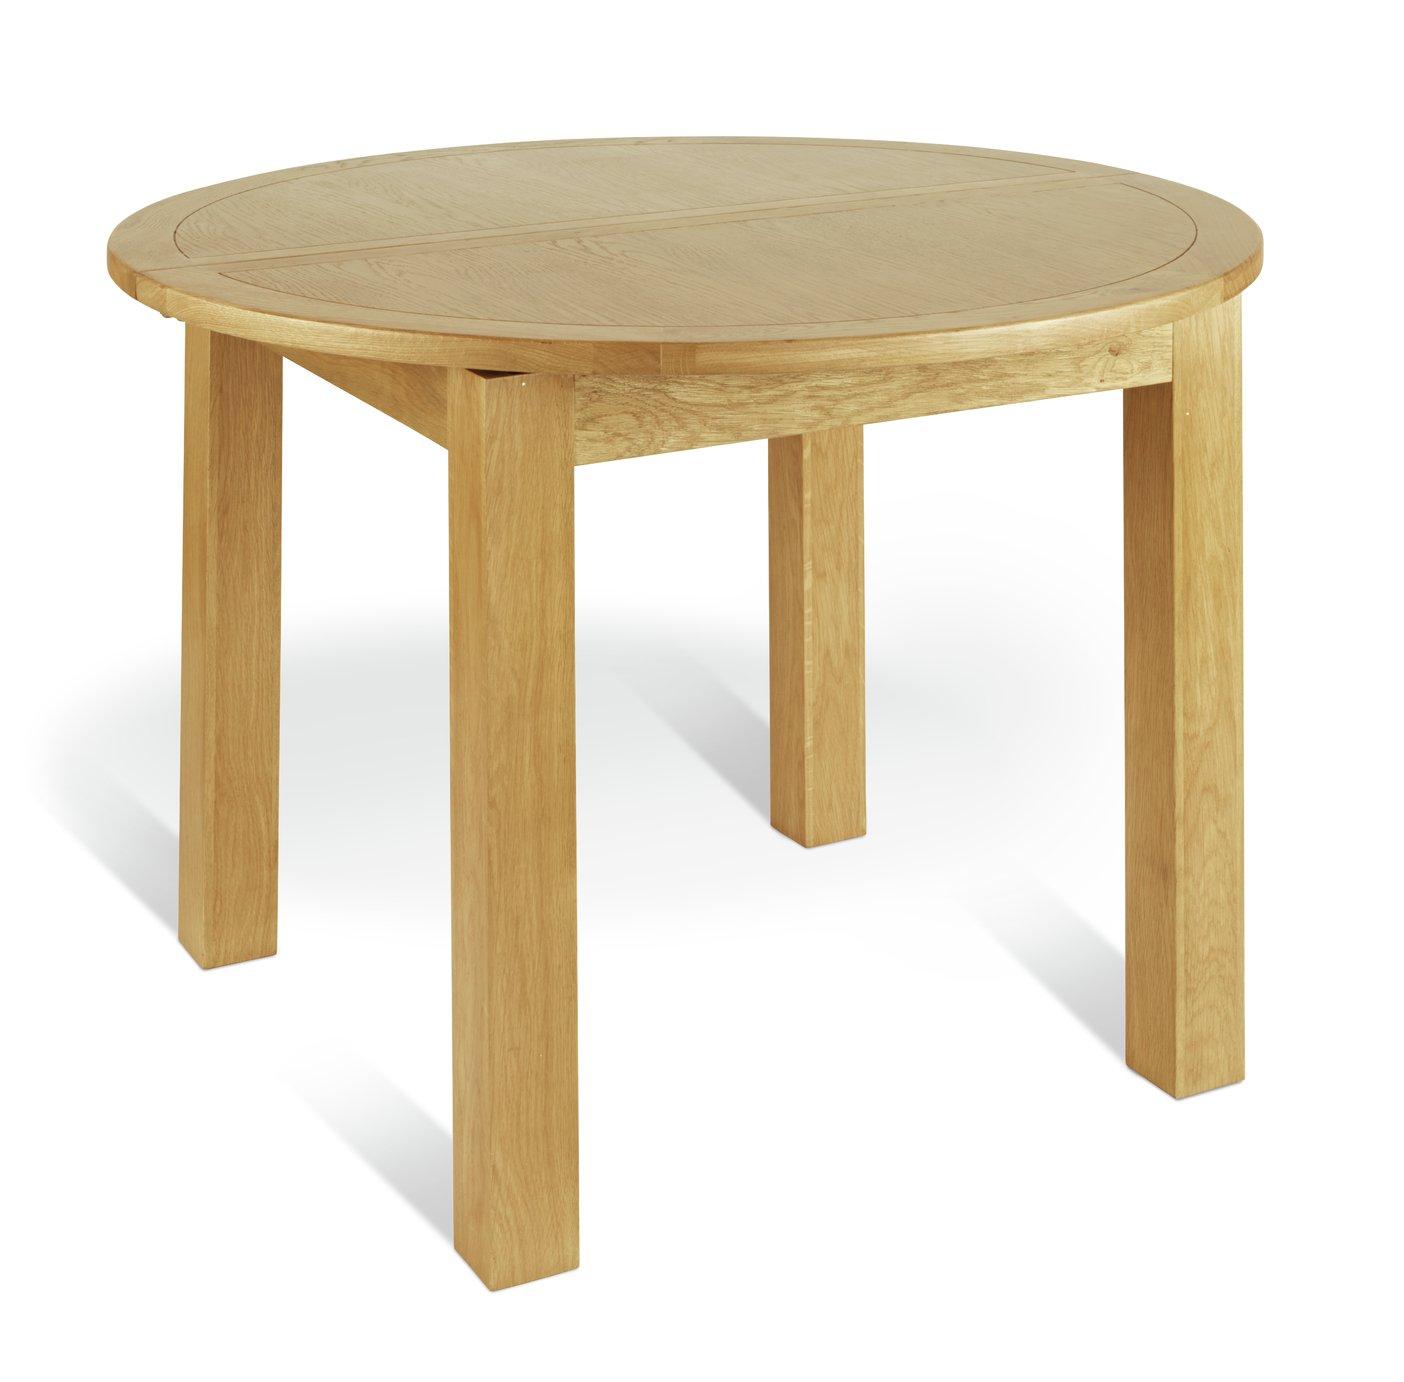 Argos Home Ashwell Extendable Circular Table - Oak Veneer